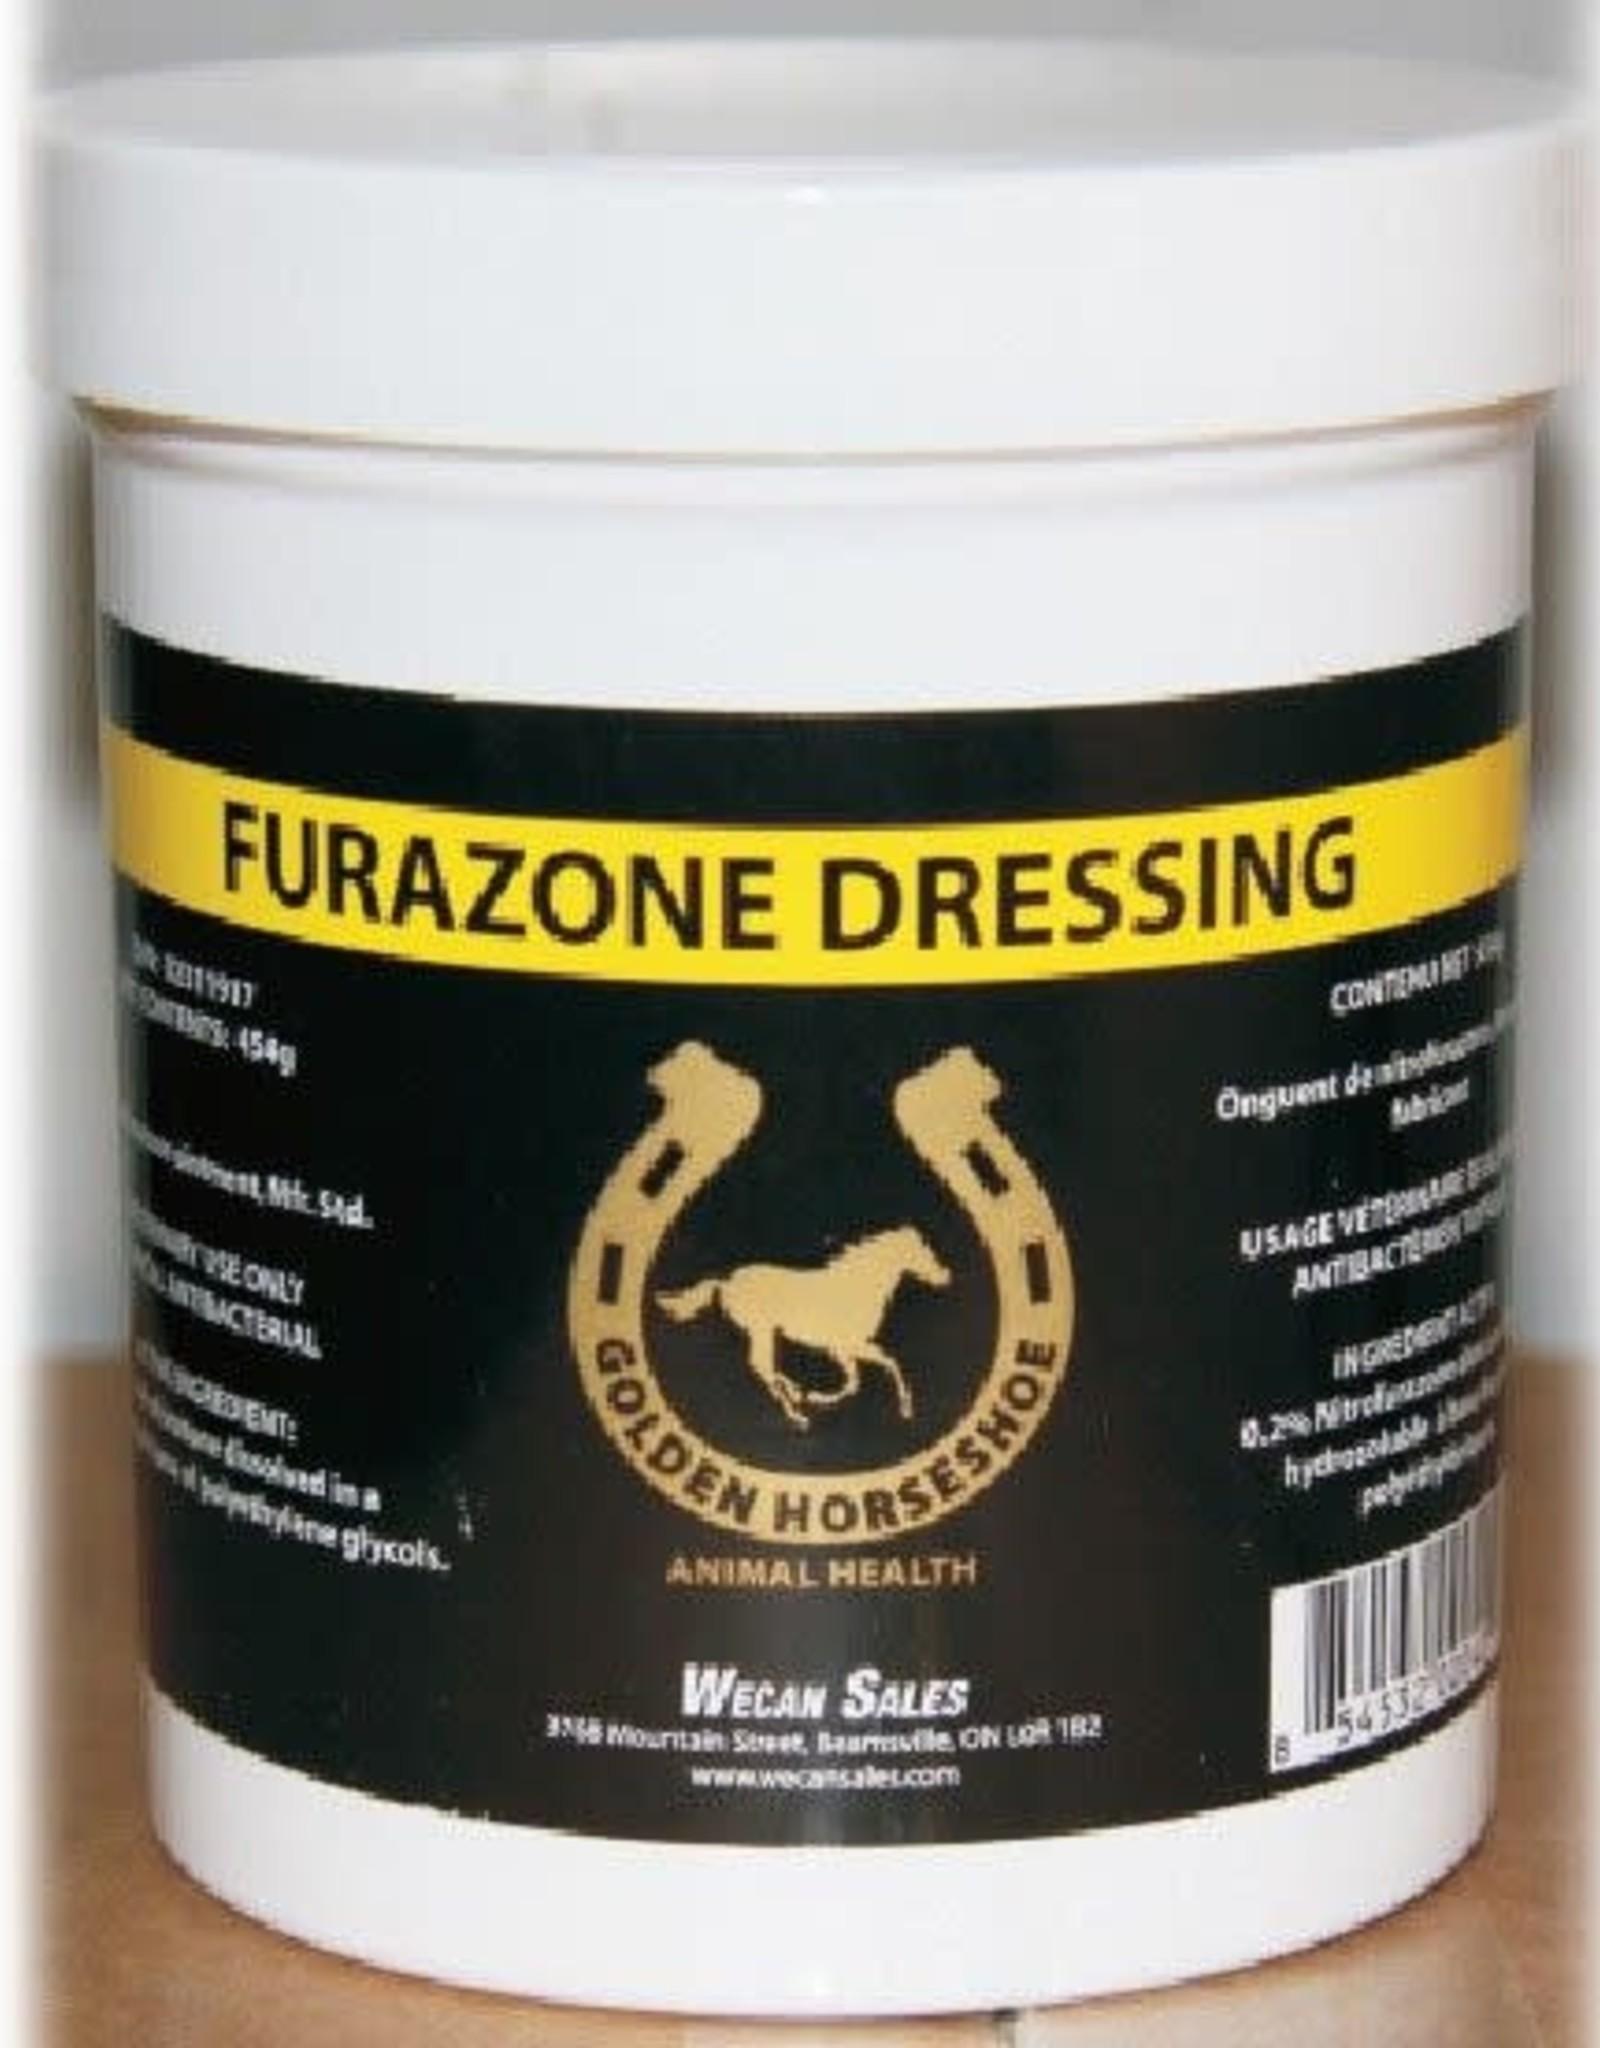 Golden Horseshoe Furazone Dressing 454g